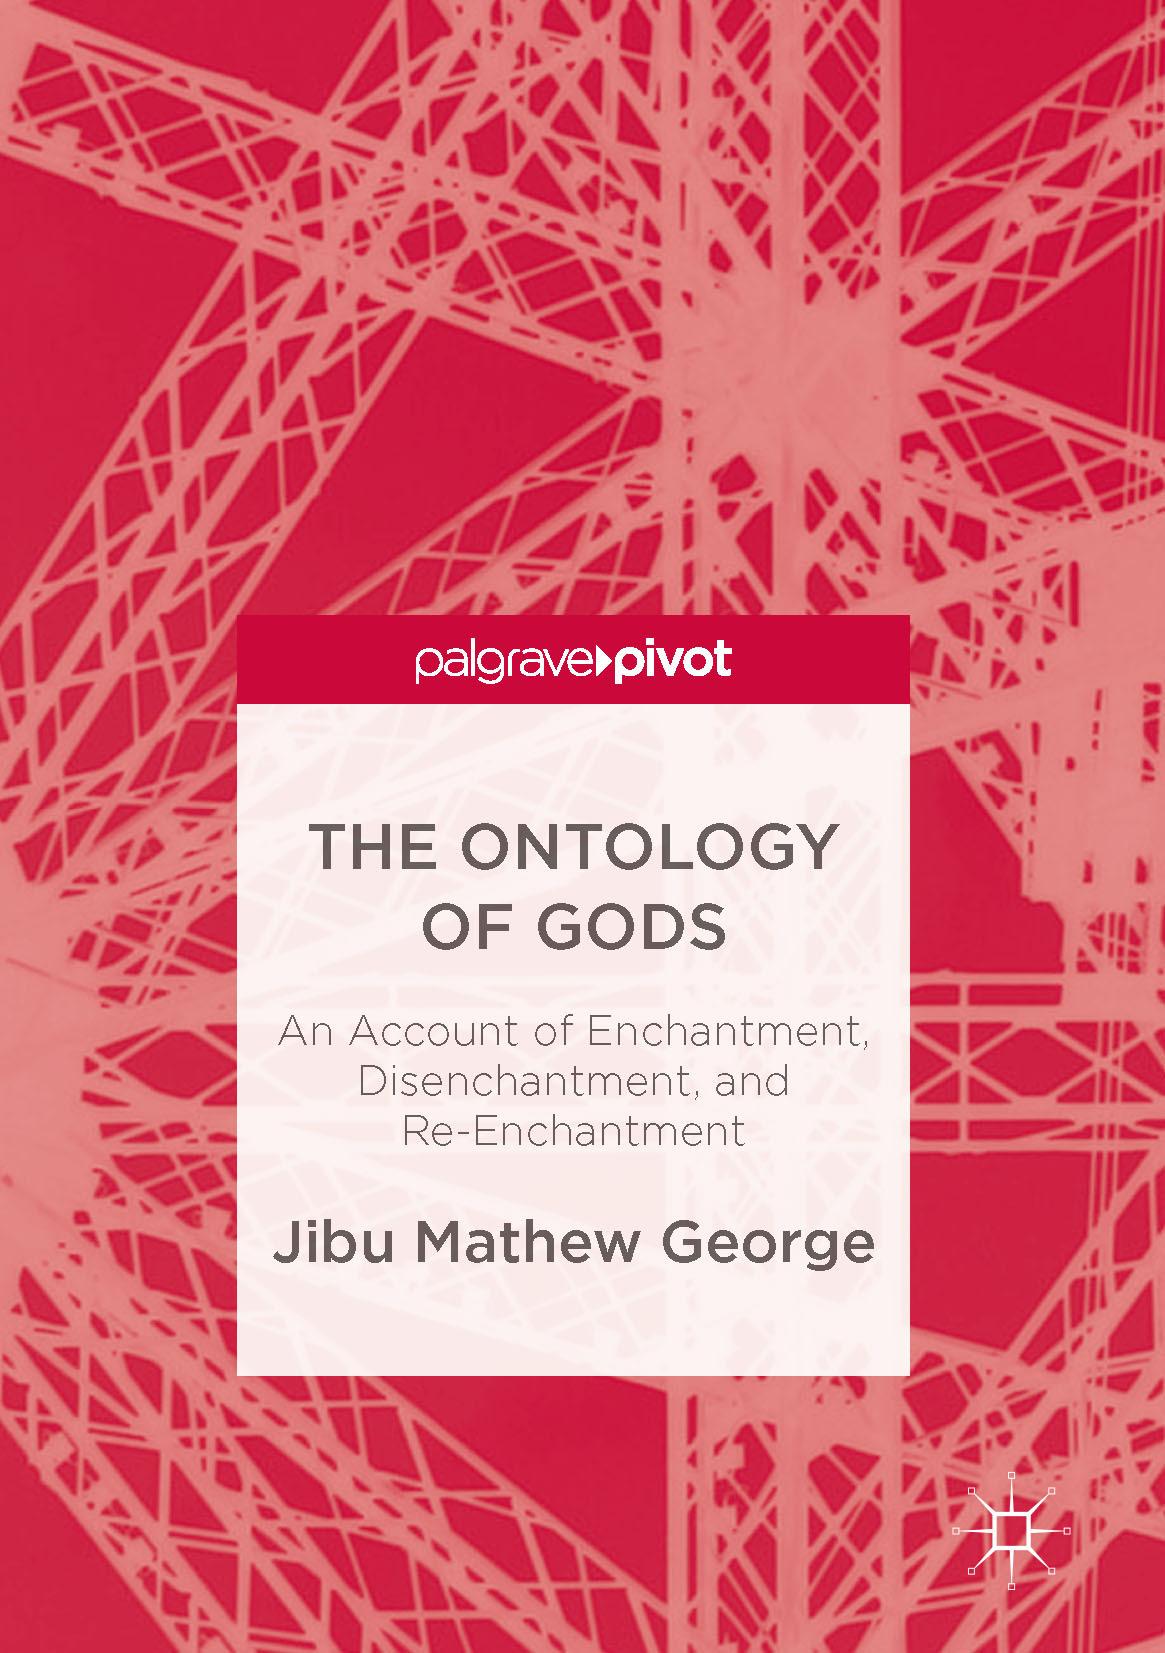 George, Jibu Mathew - The Ontology of Gods, ebook